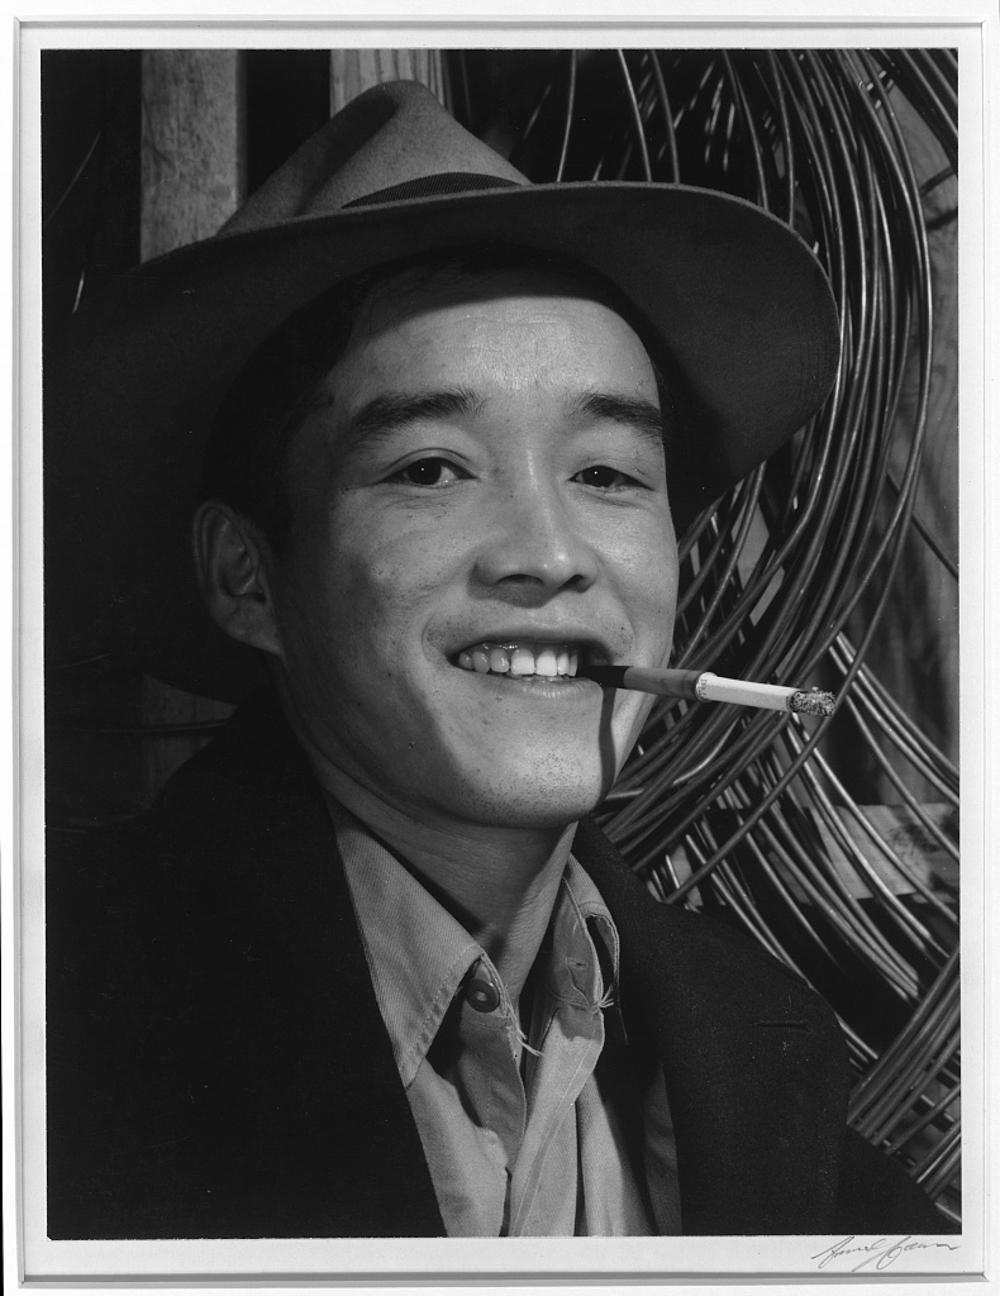 Yonehisa Yamagami, electrician, Manzanar Relocation Center, California